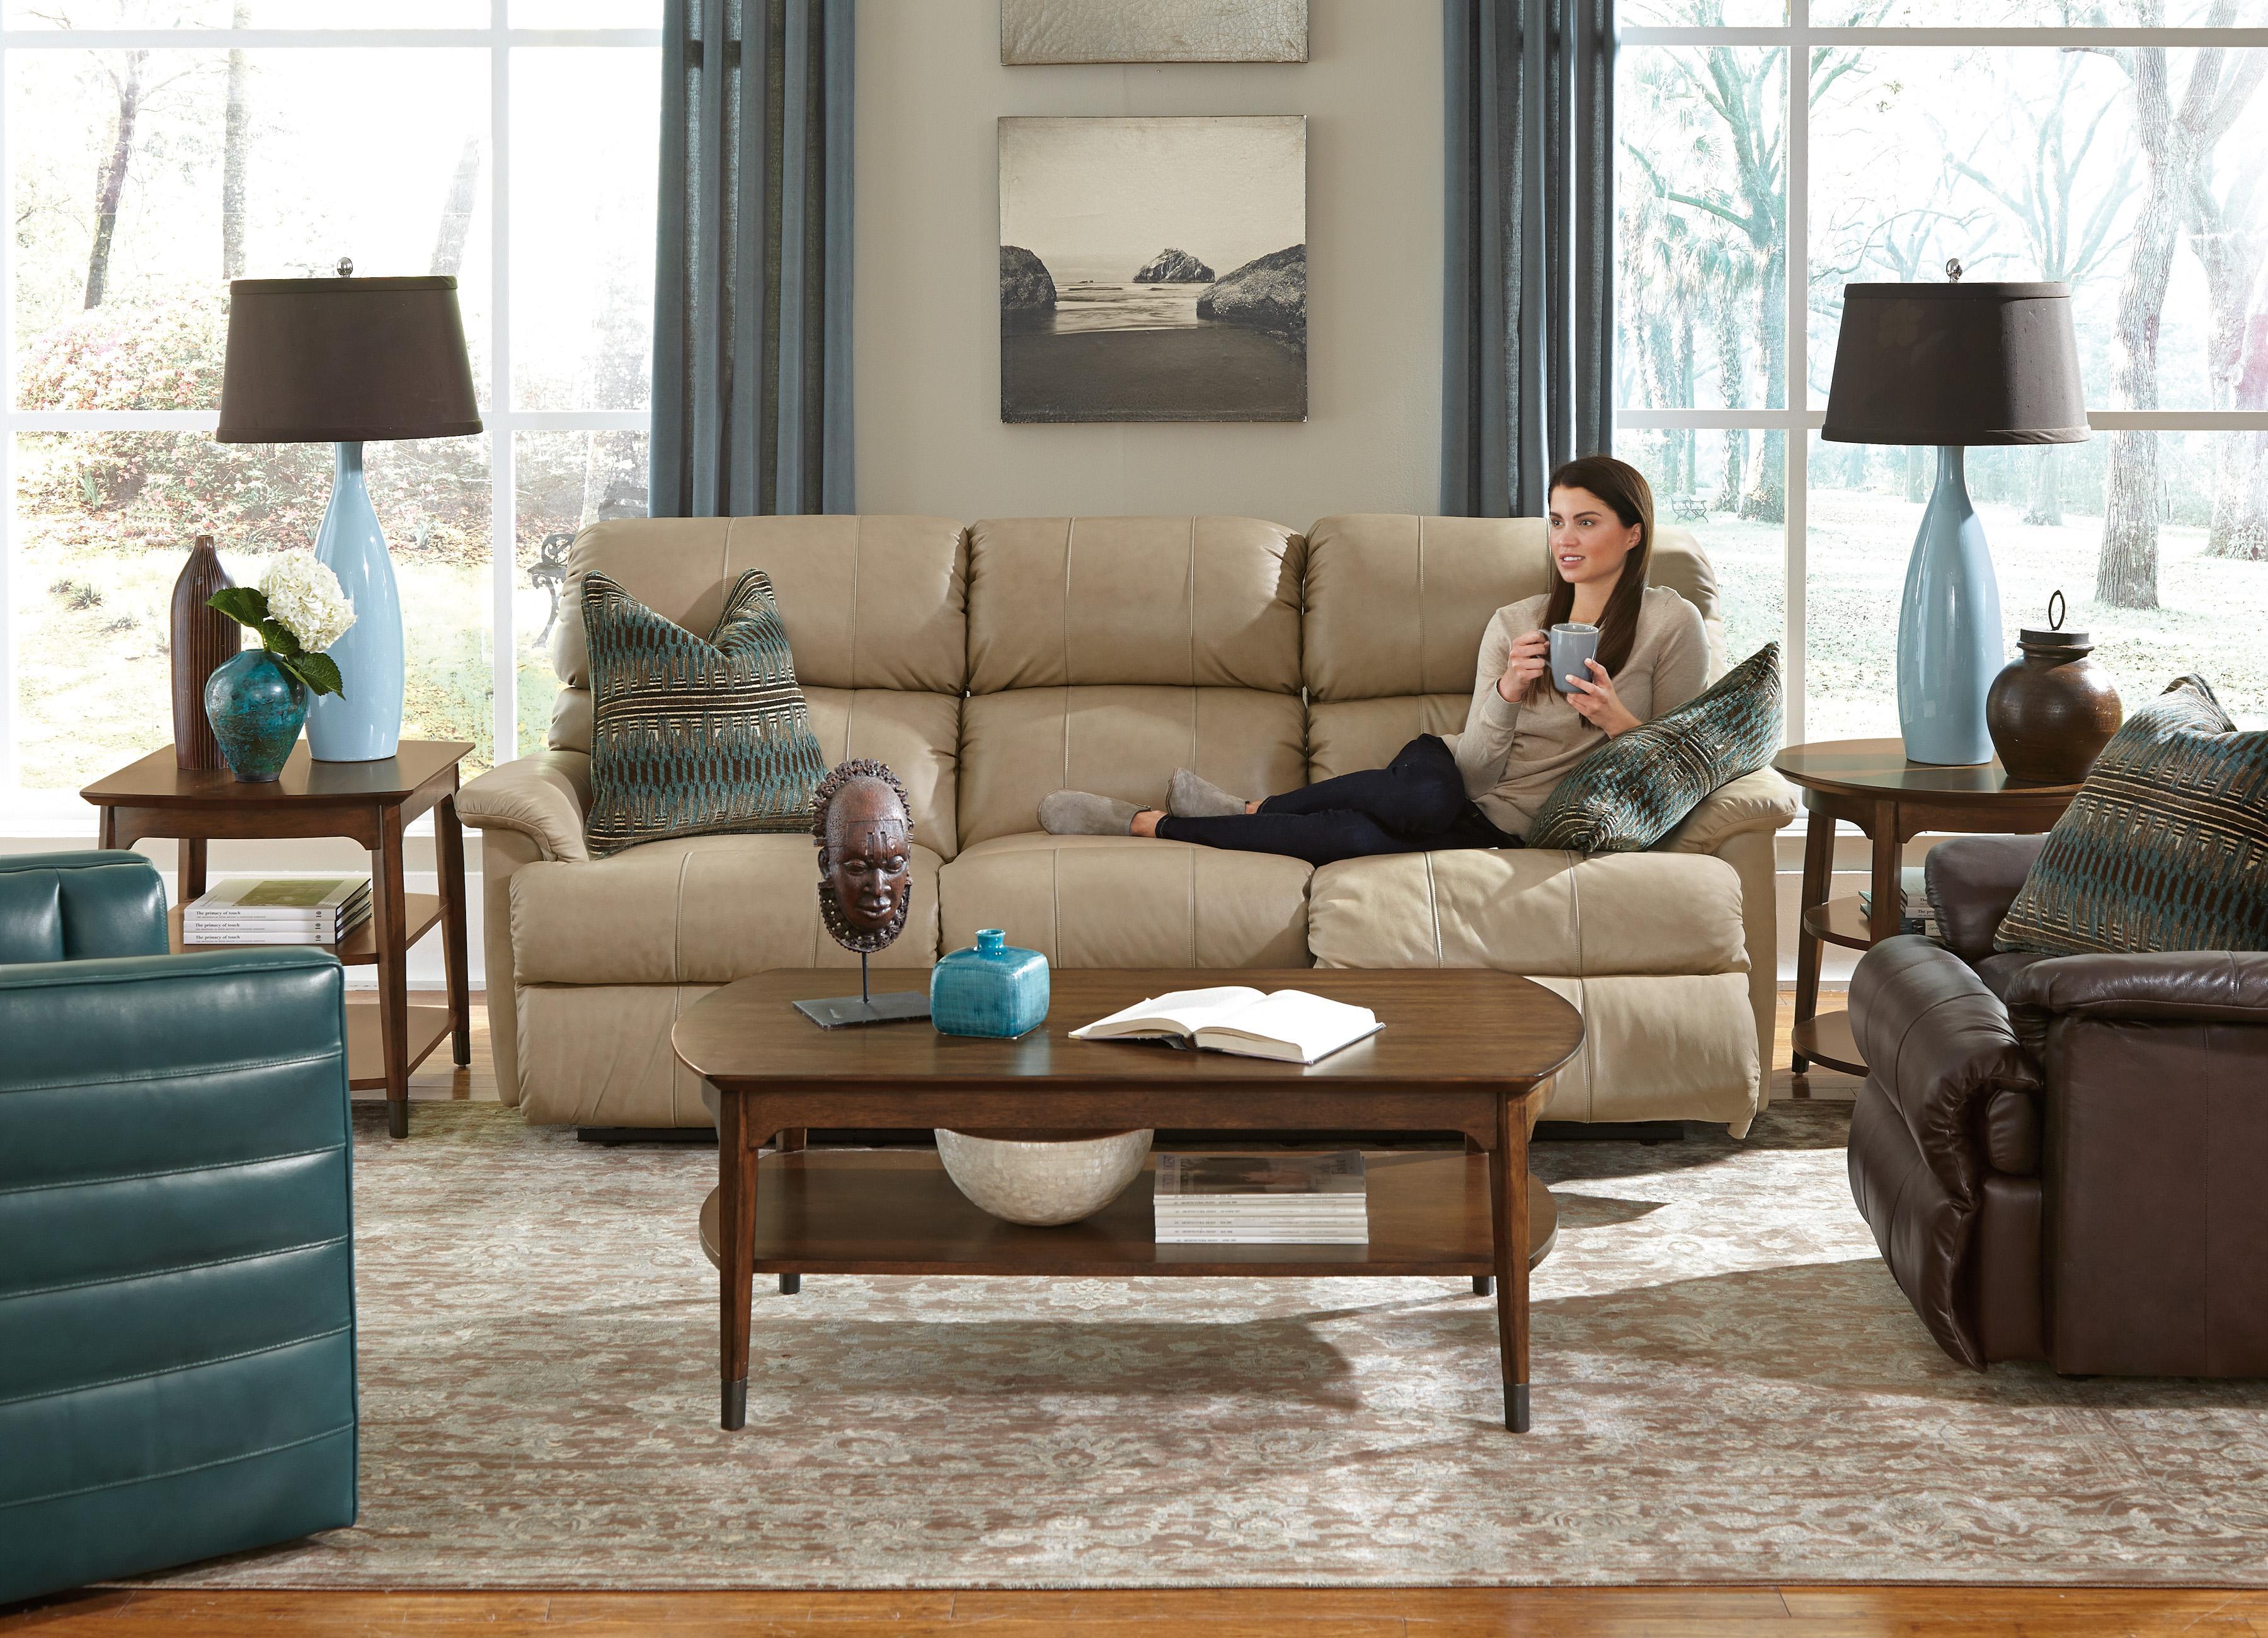 Flexsteel Chicago Power Reclining Sofa - Dunk u0026 Bright Furniture - Reclining Sofas